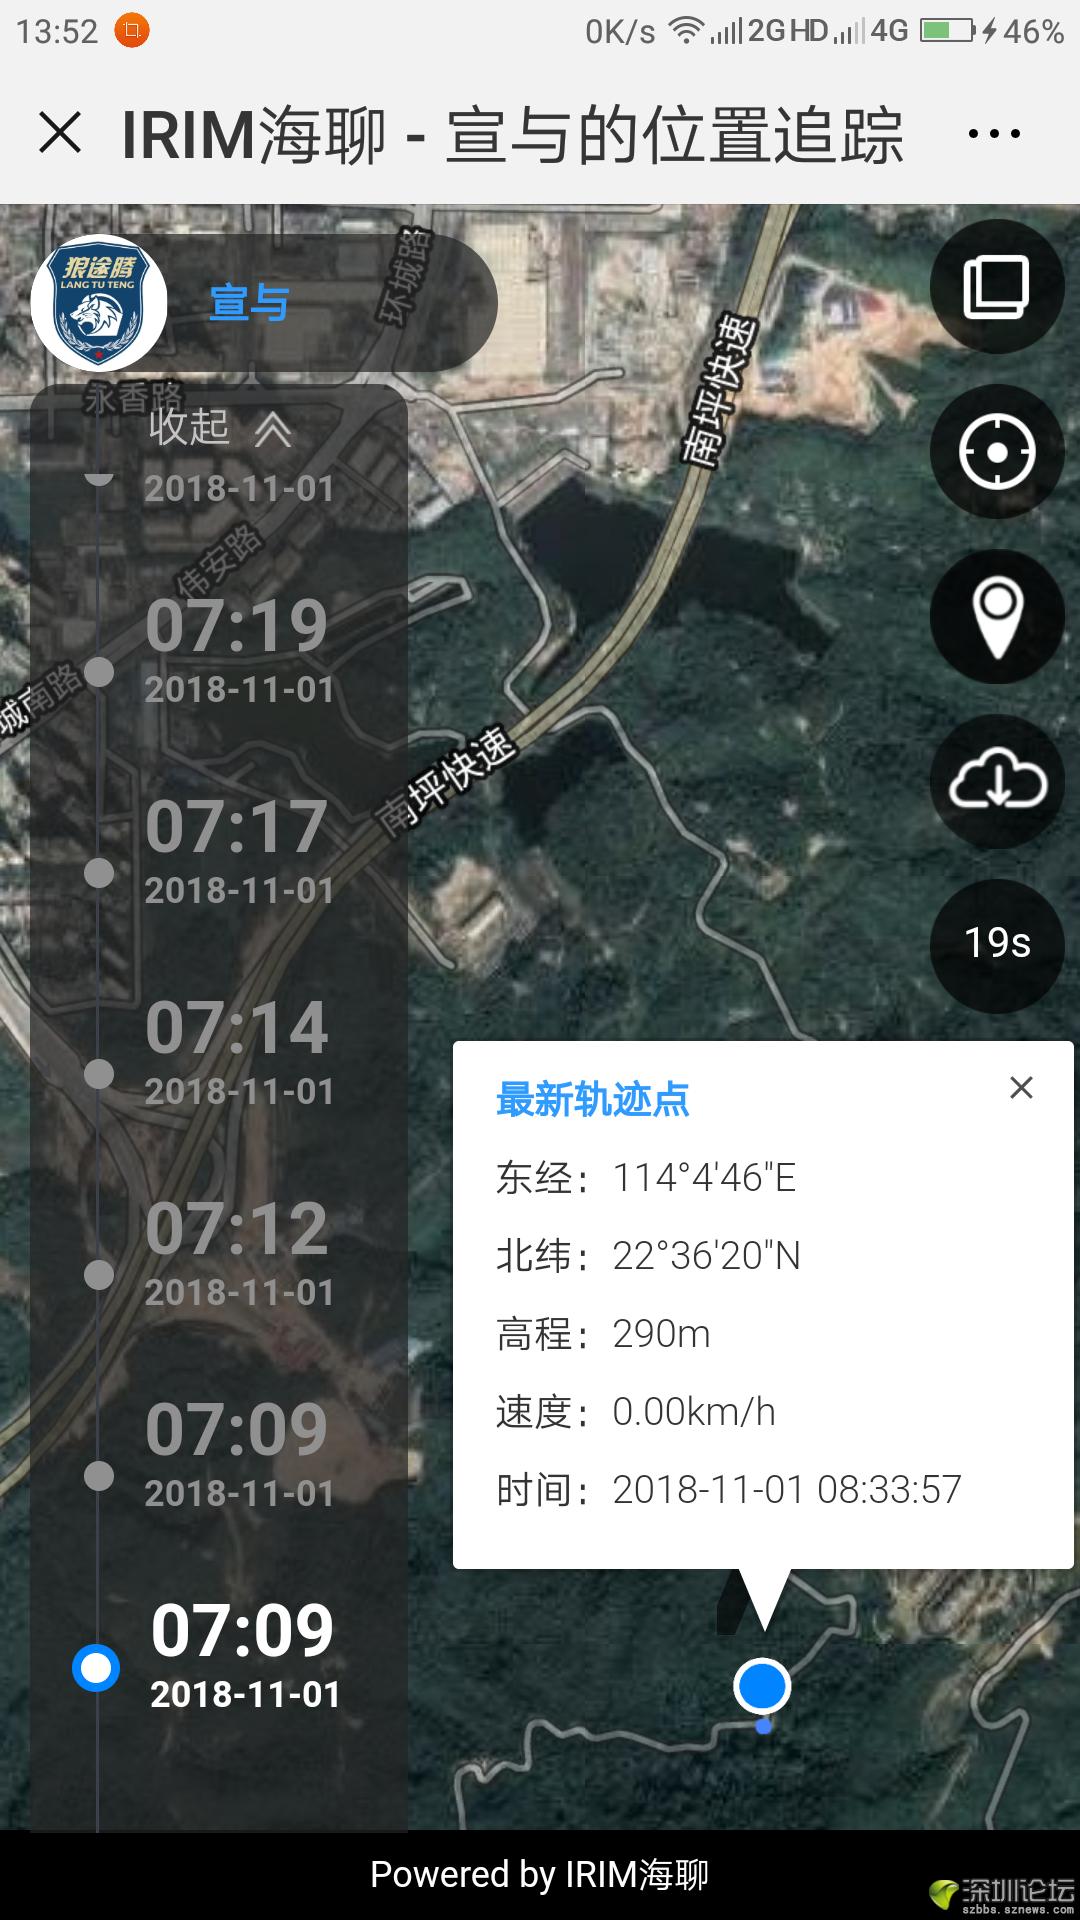 Screenshot_2018-11-01-13-53-01-1654660492.png